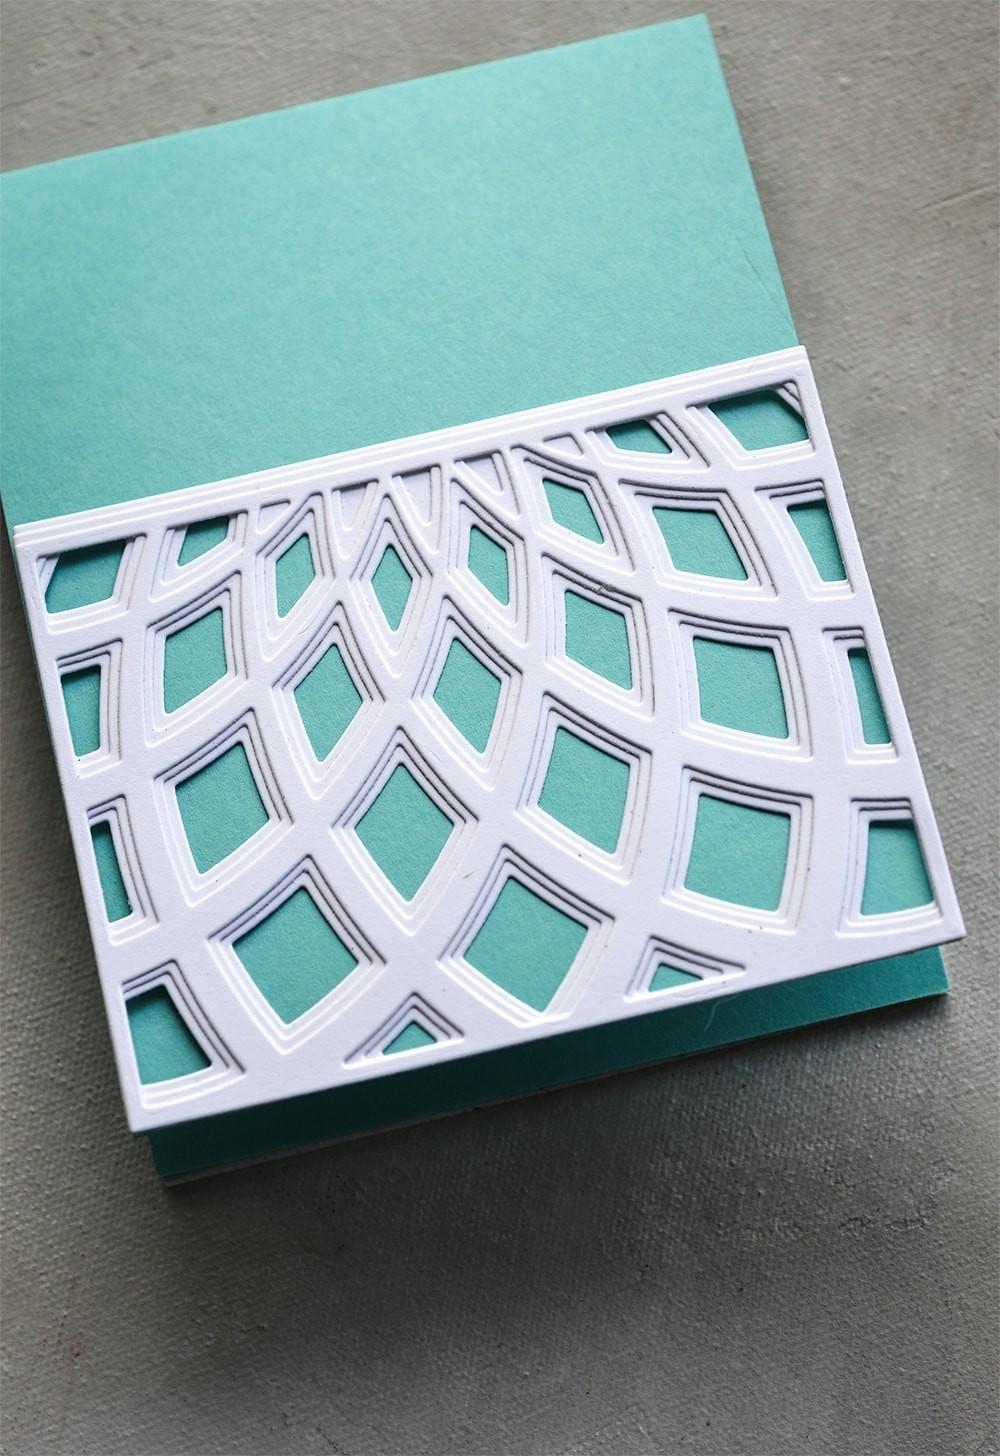 Birch Press Dazzle Bevel Plate Layer Set 56106